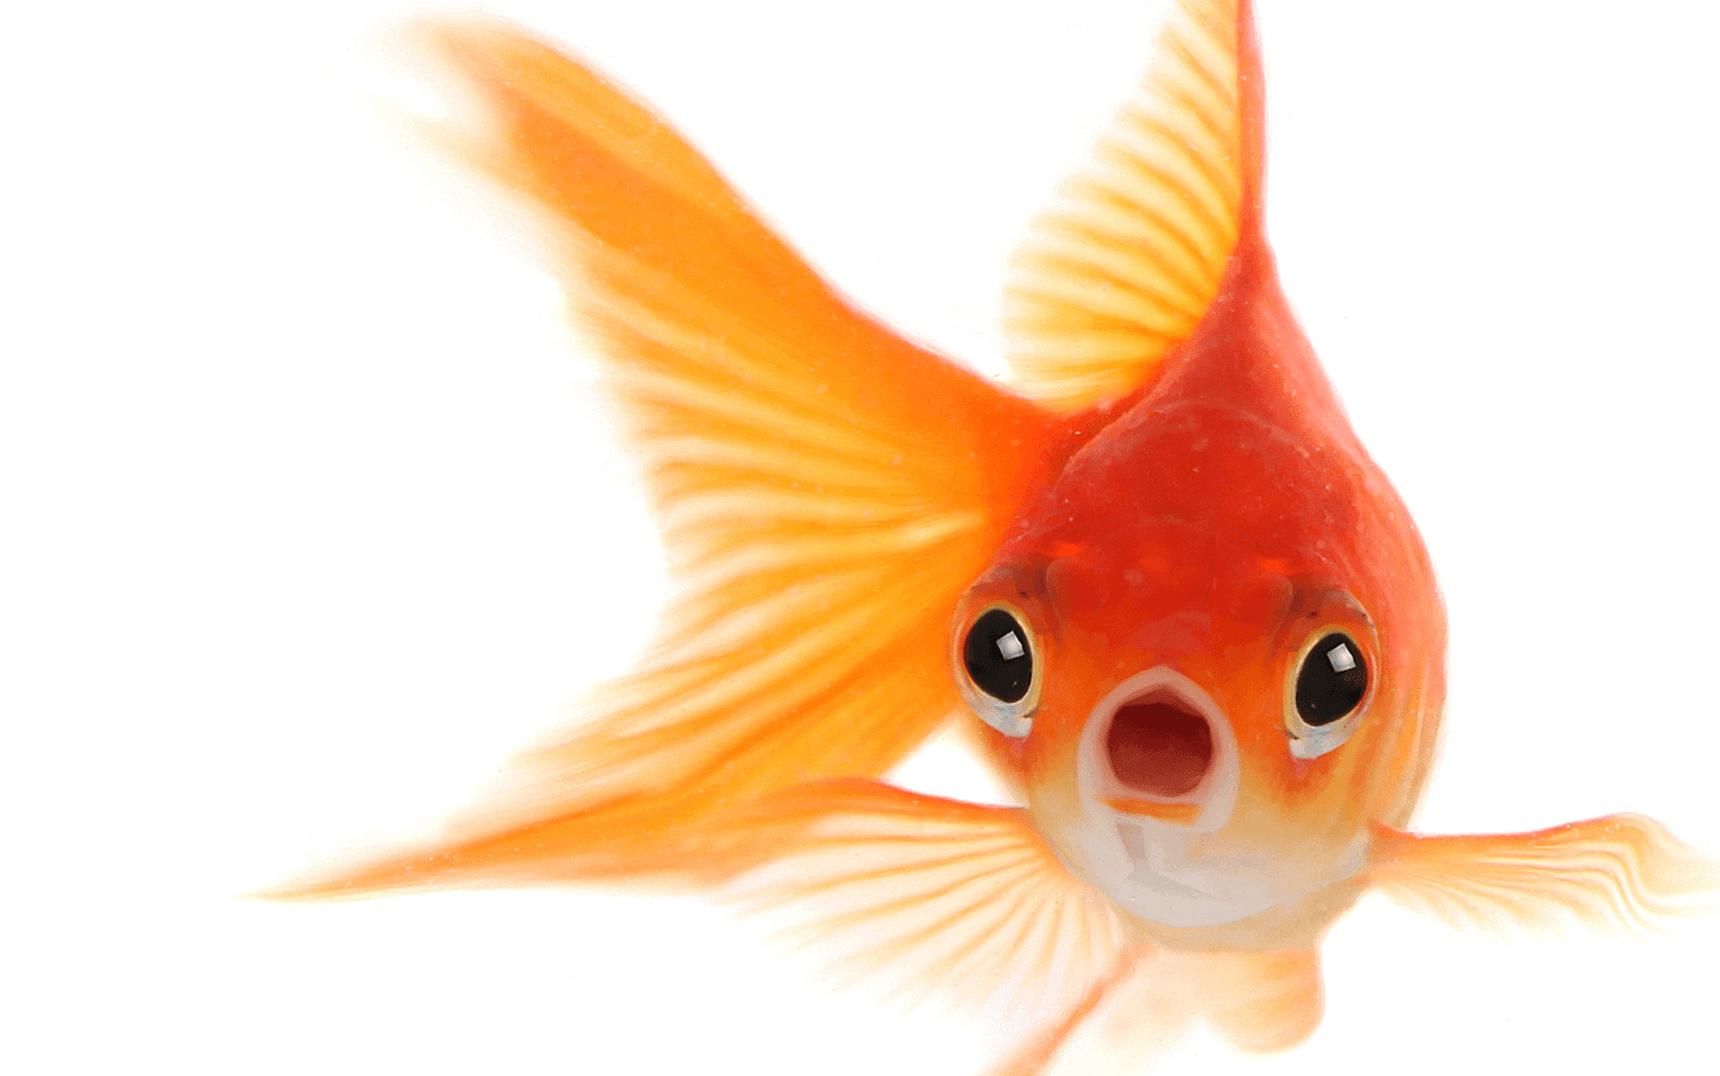 goldfish png www pixshark com images galleries with a goldfish clip art free goldfish clipart watercolor